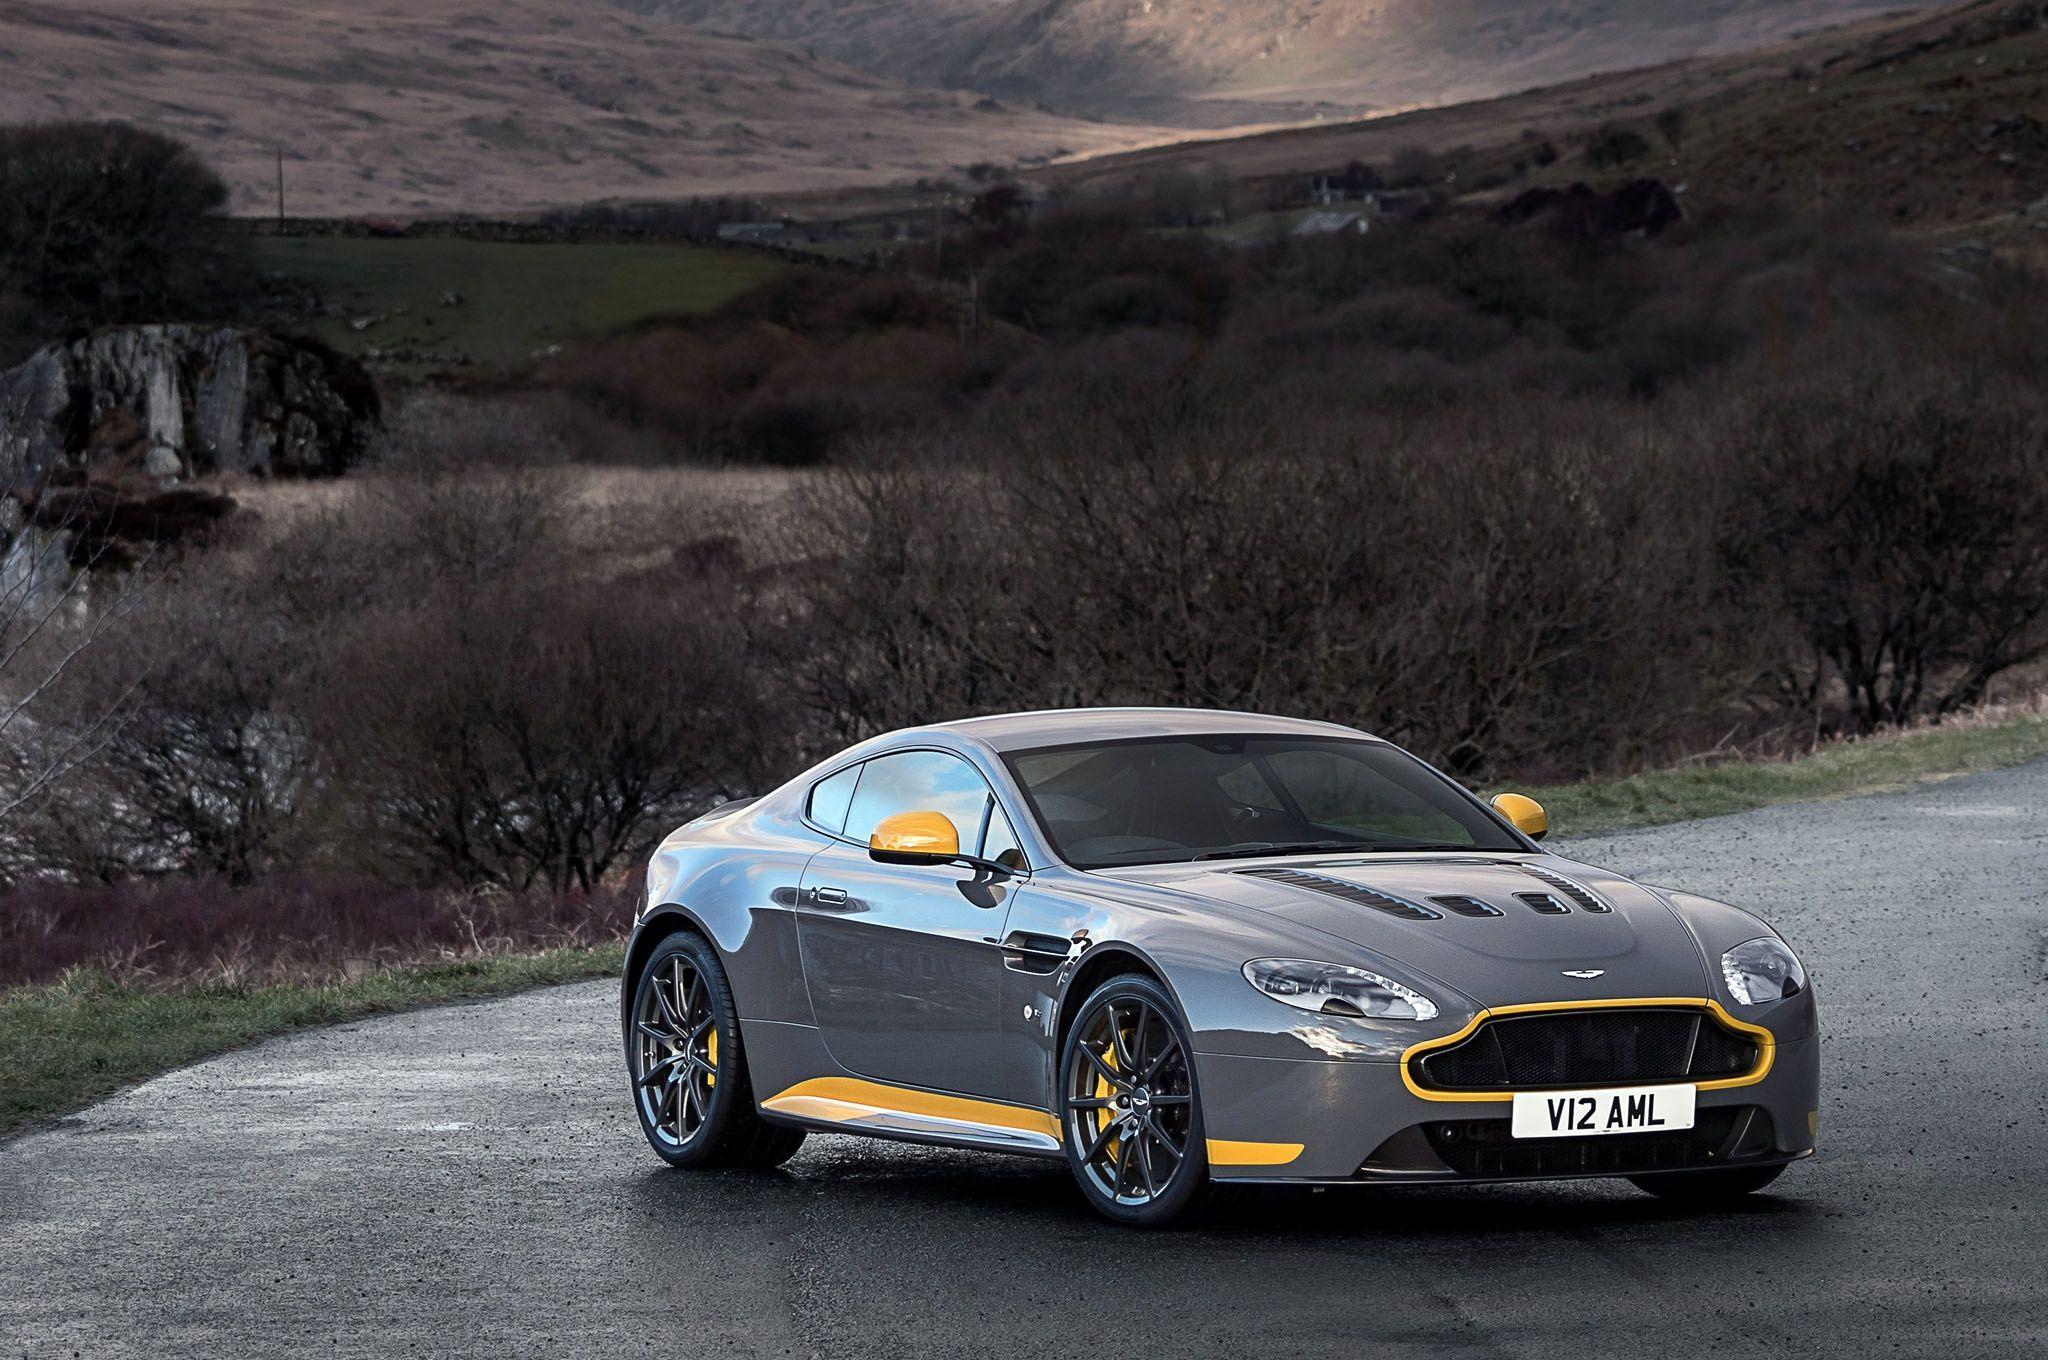 Aston Martin Vanquish 2017 Wallpapers Wallpaper Cave